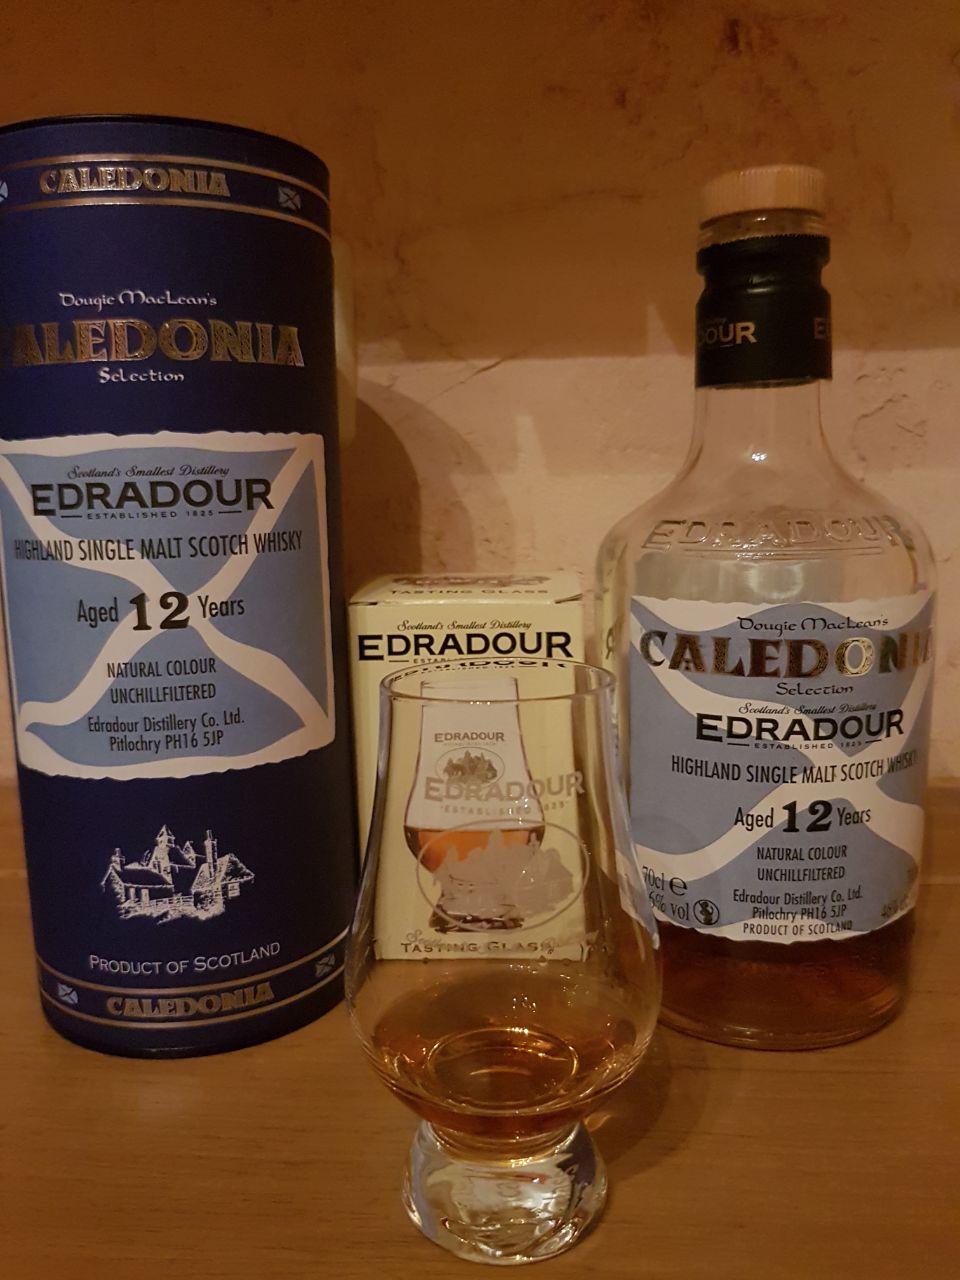 Edradour 12 Jahre Caledonia Single Malt Scotch Whisky